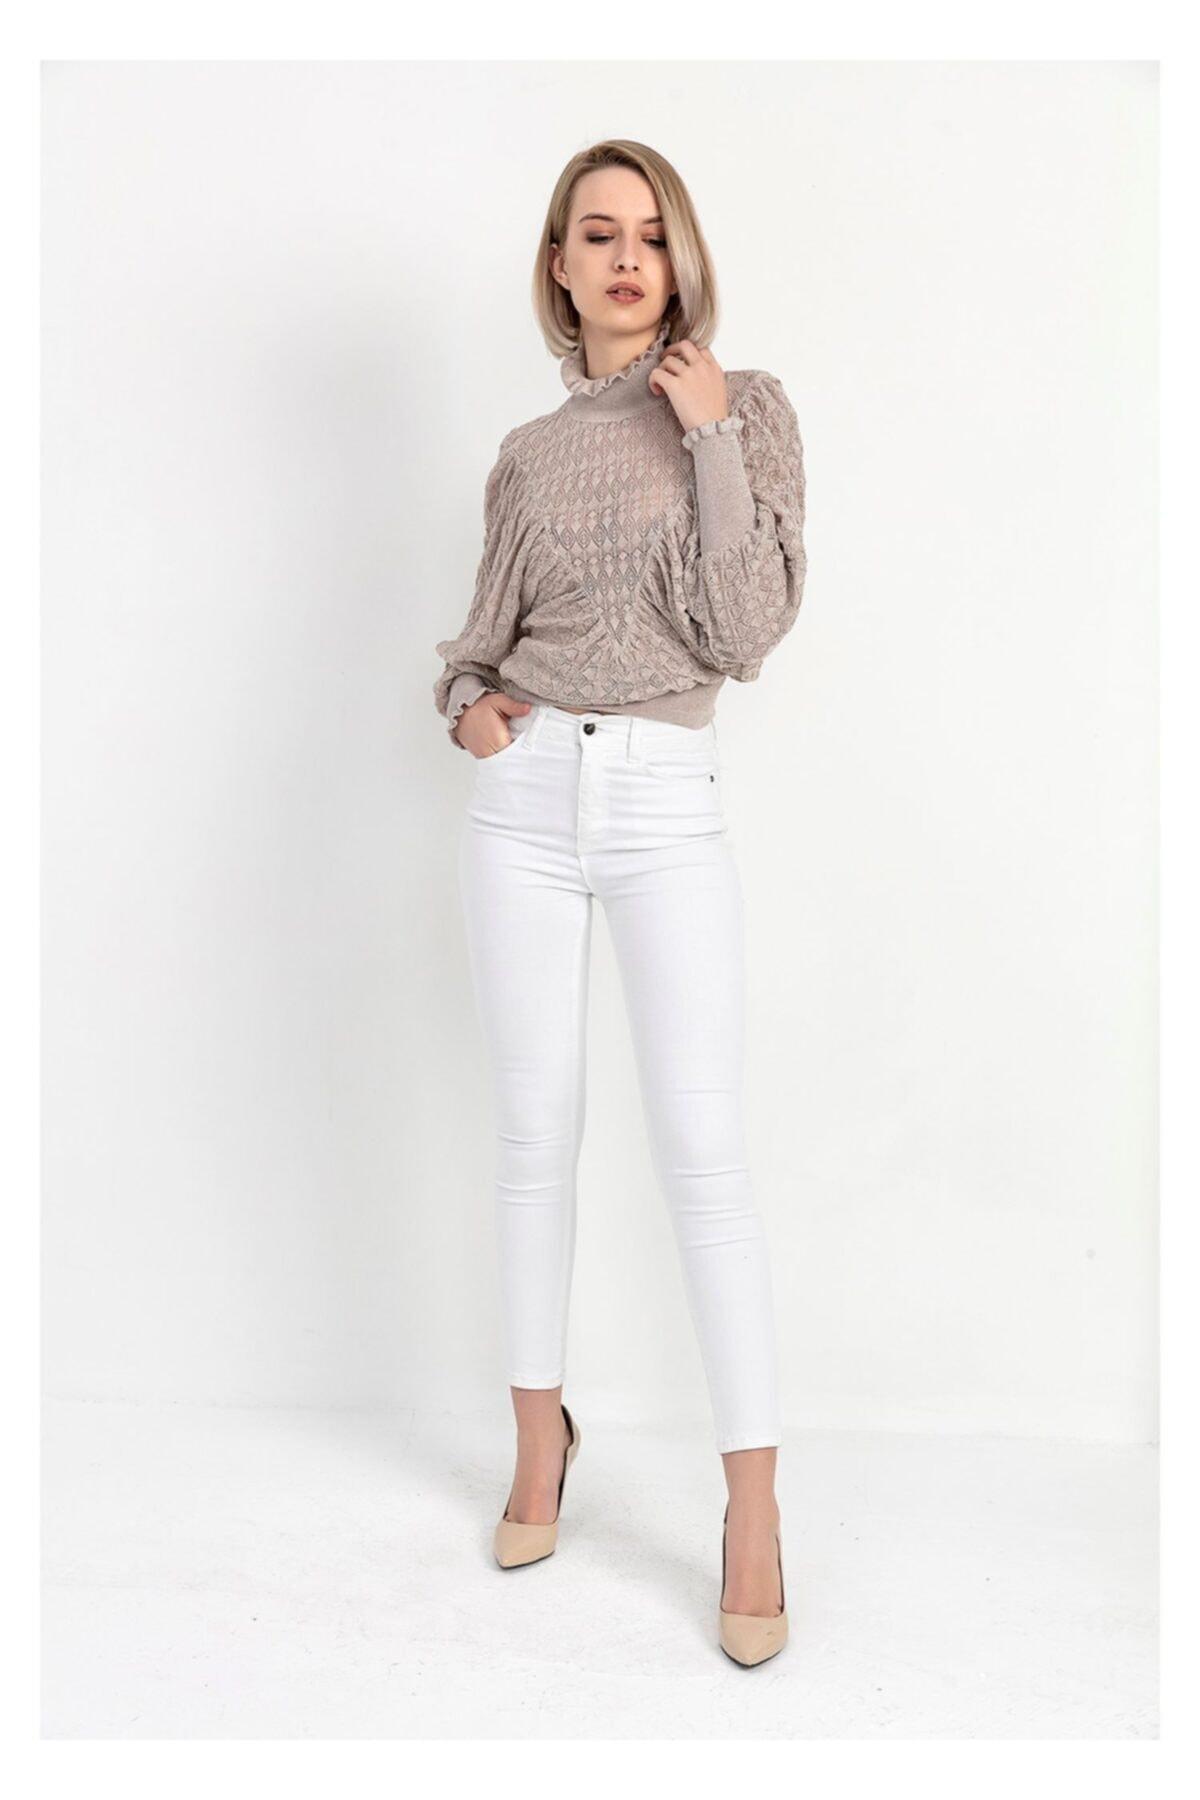 TIFFANY&TOMATO Yüksek Bel Skinny Jean Pantolon - Beyaz 1